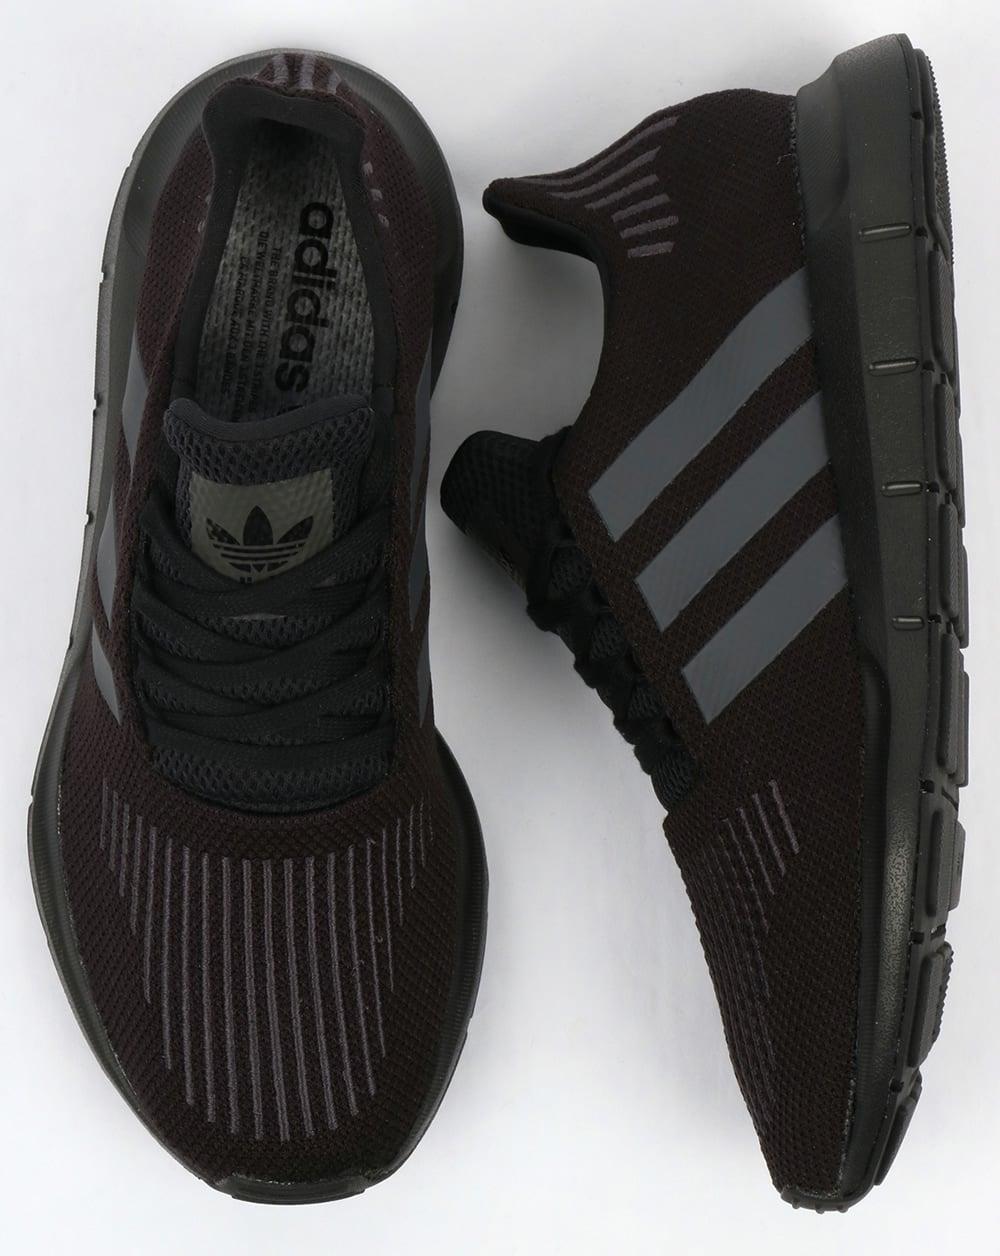 fe01f74ce325 Adidas Swift Run Trainers Black